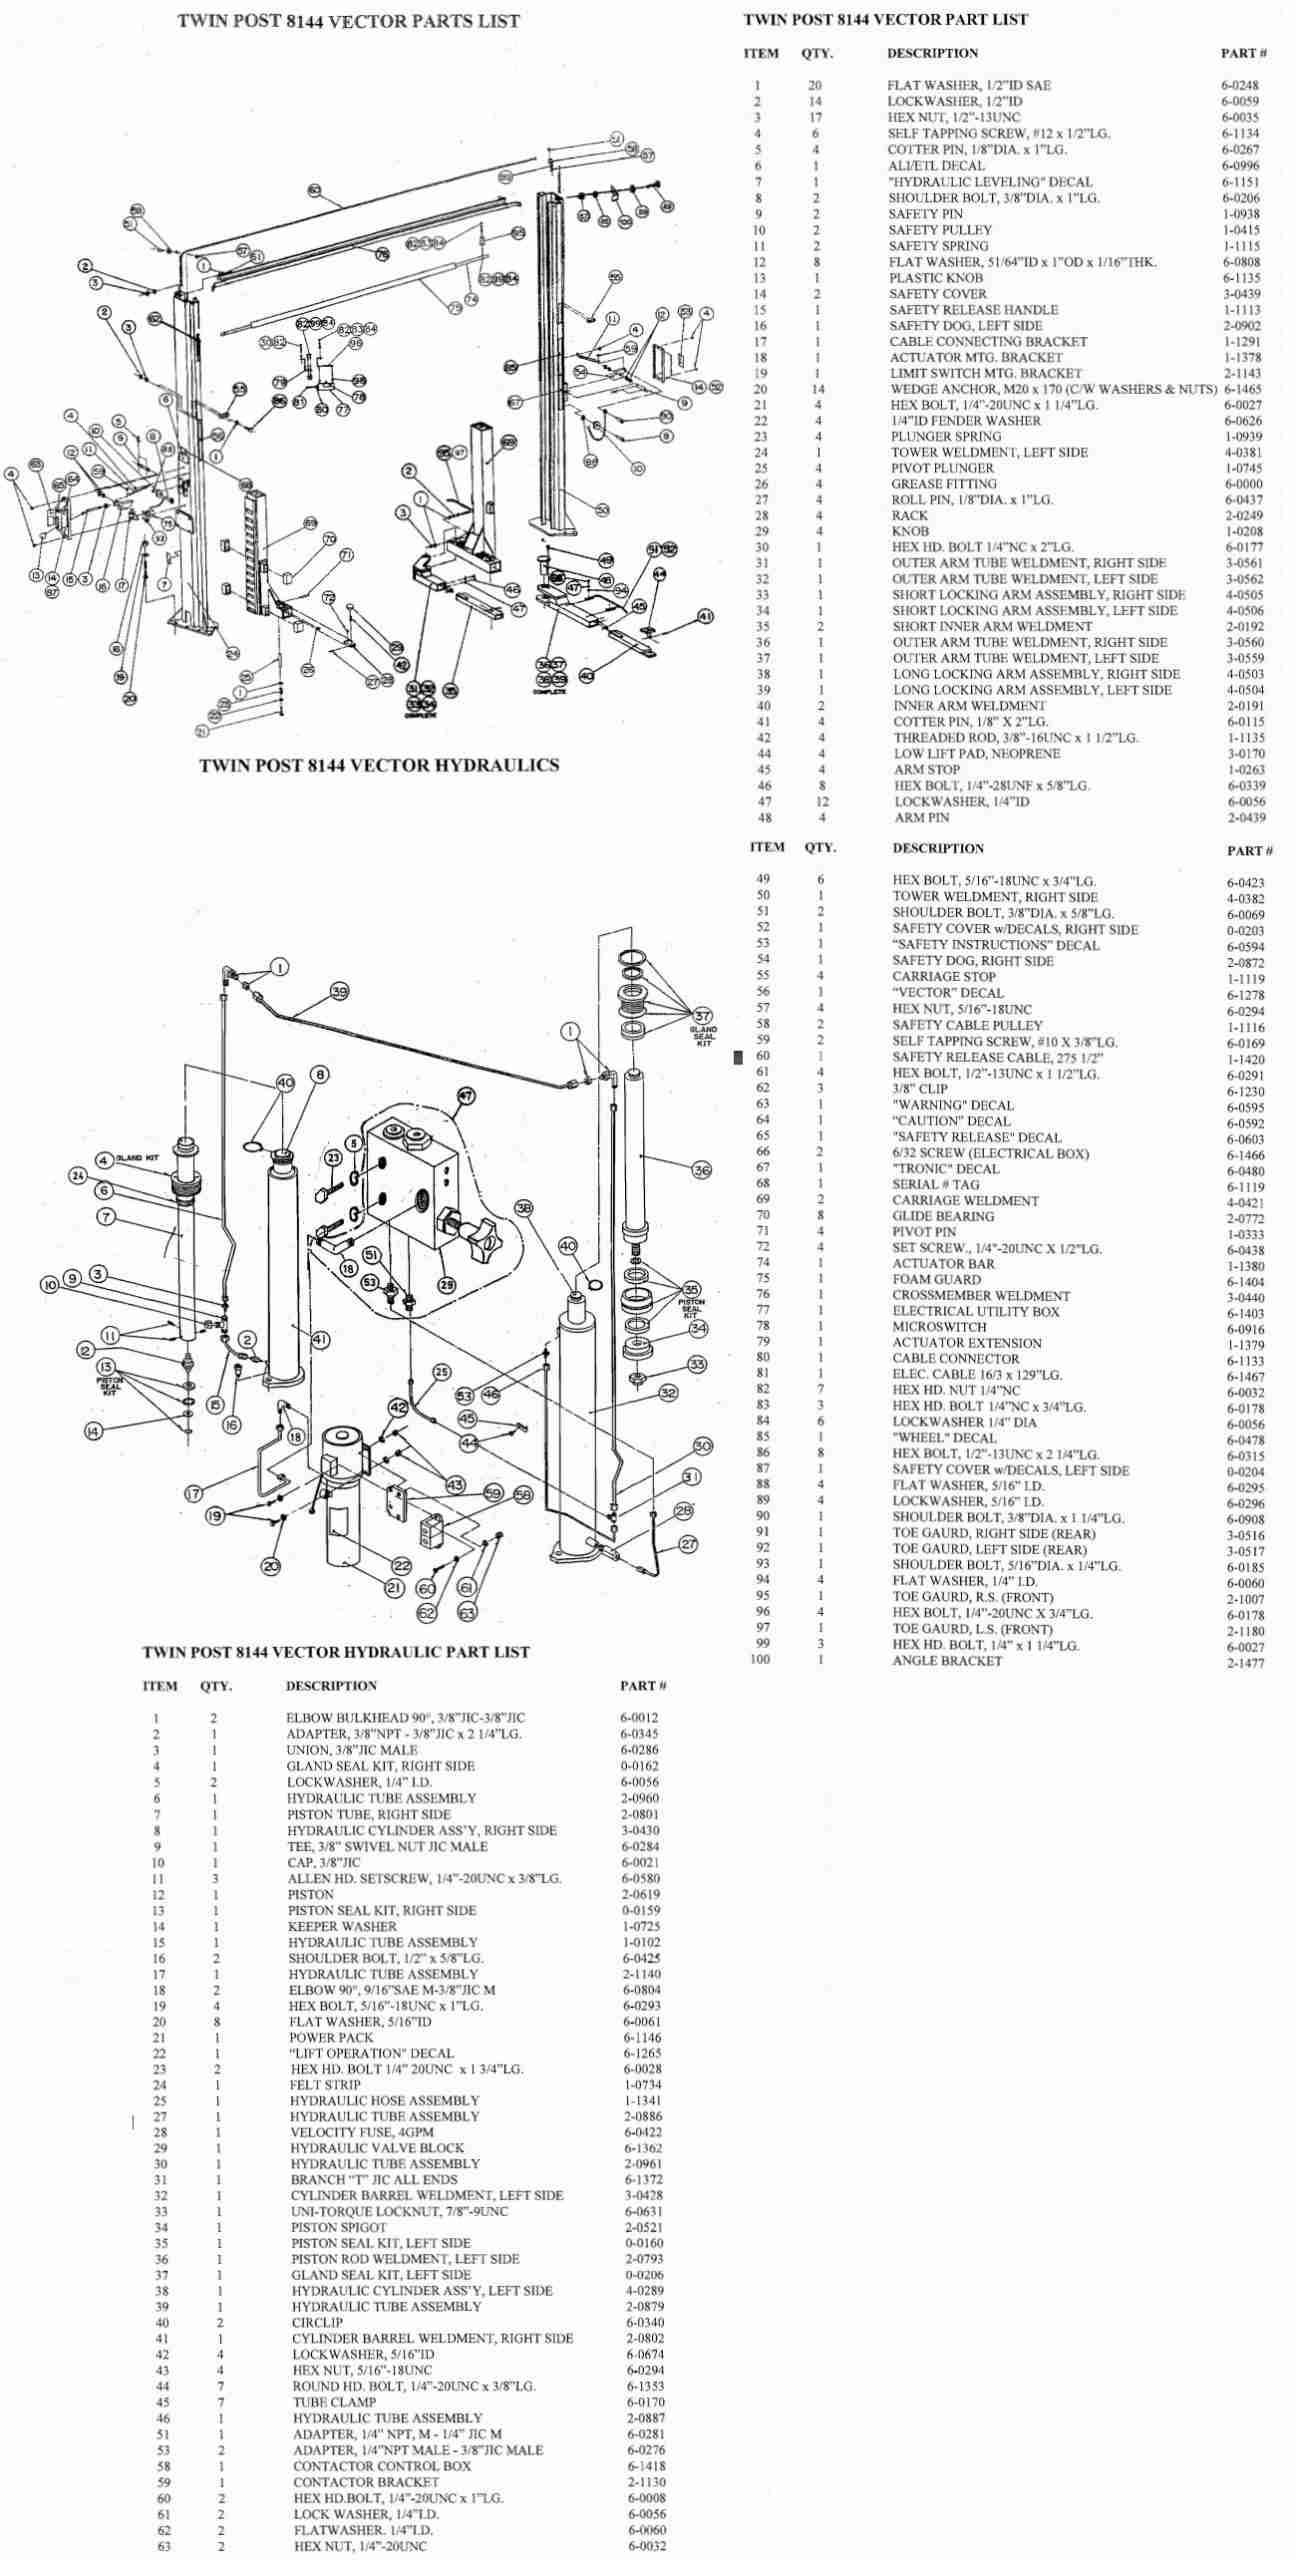 WHEELTRONIC 8144 PARTS MANUAL